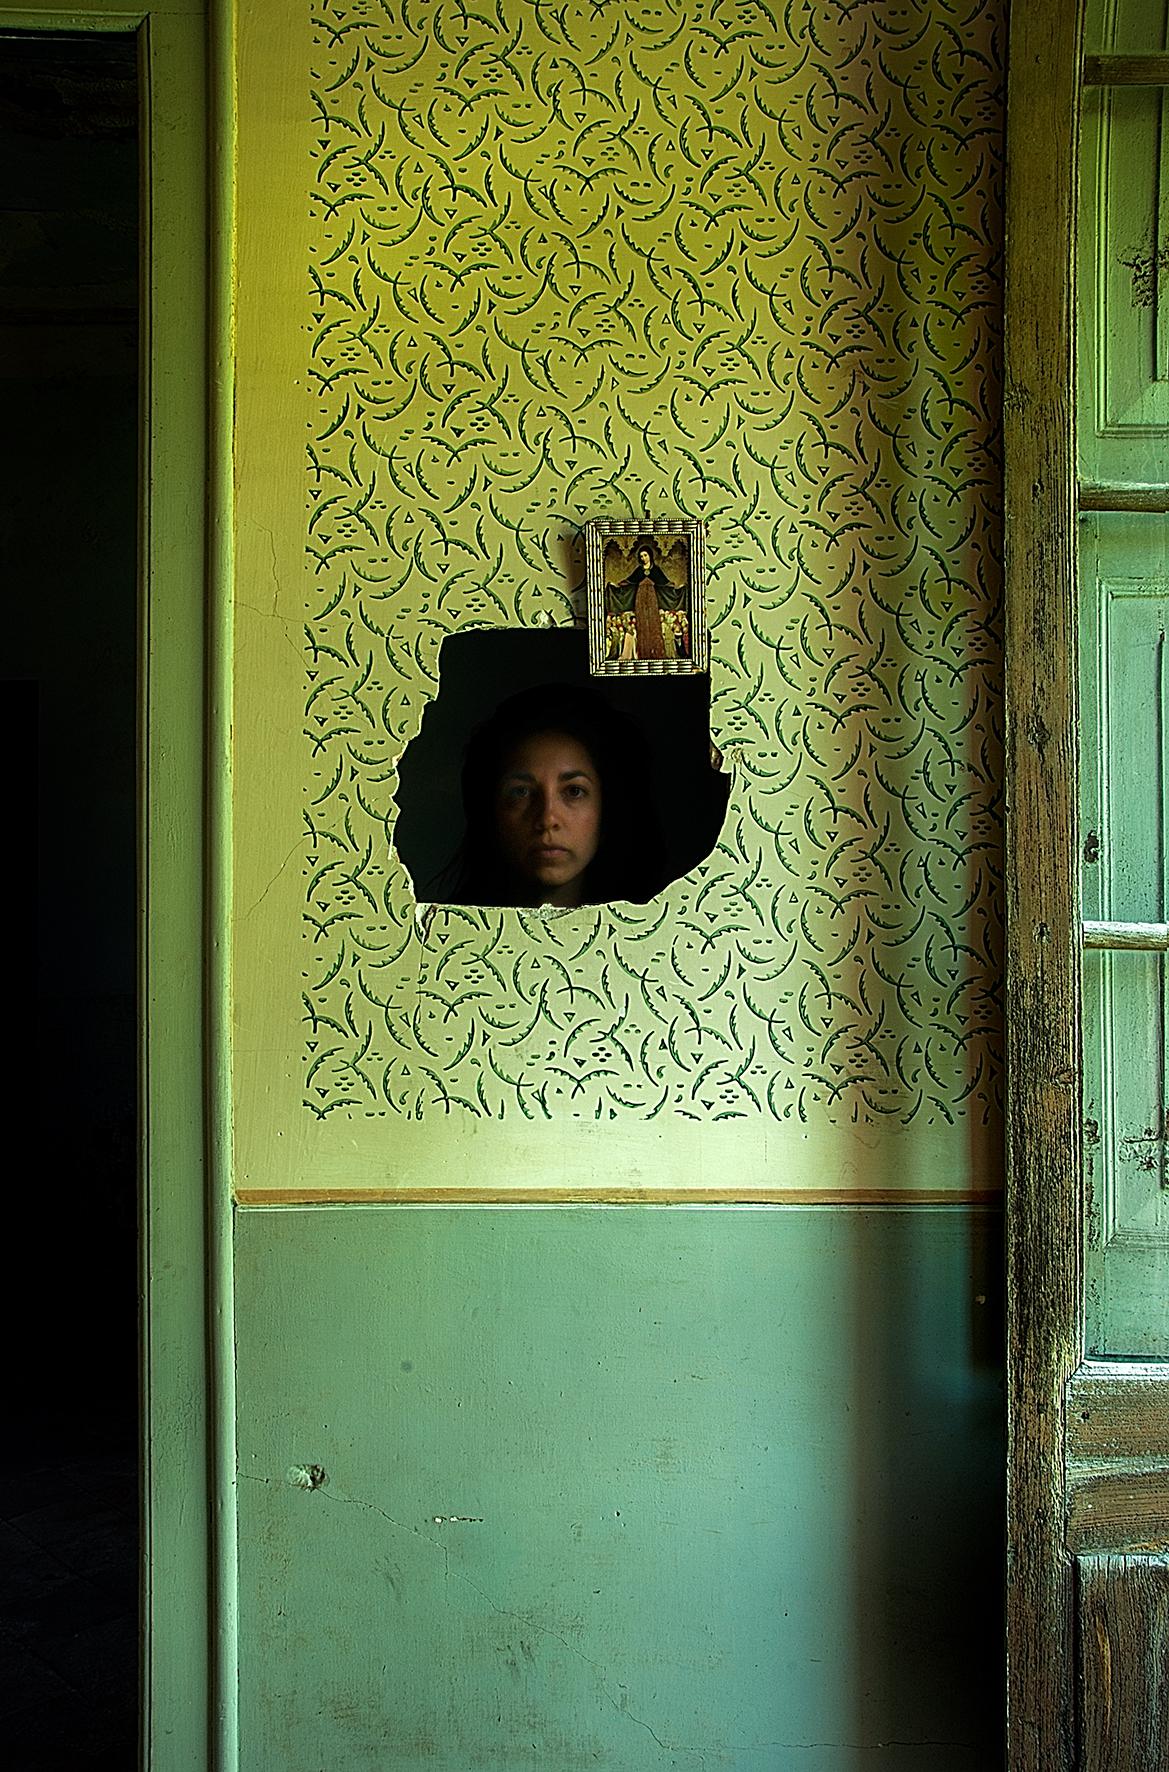 The Image, Cal Rosal, 2012